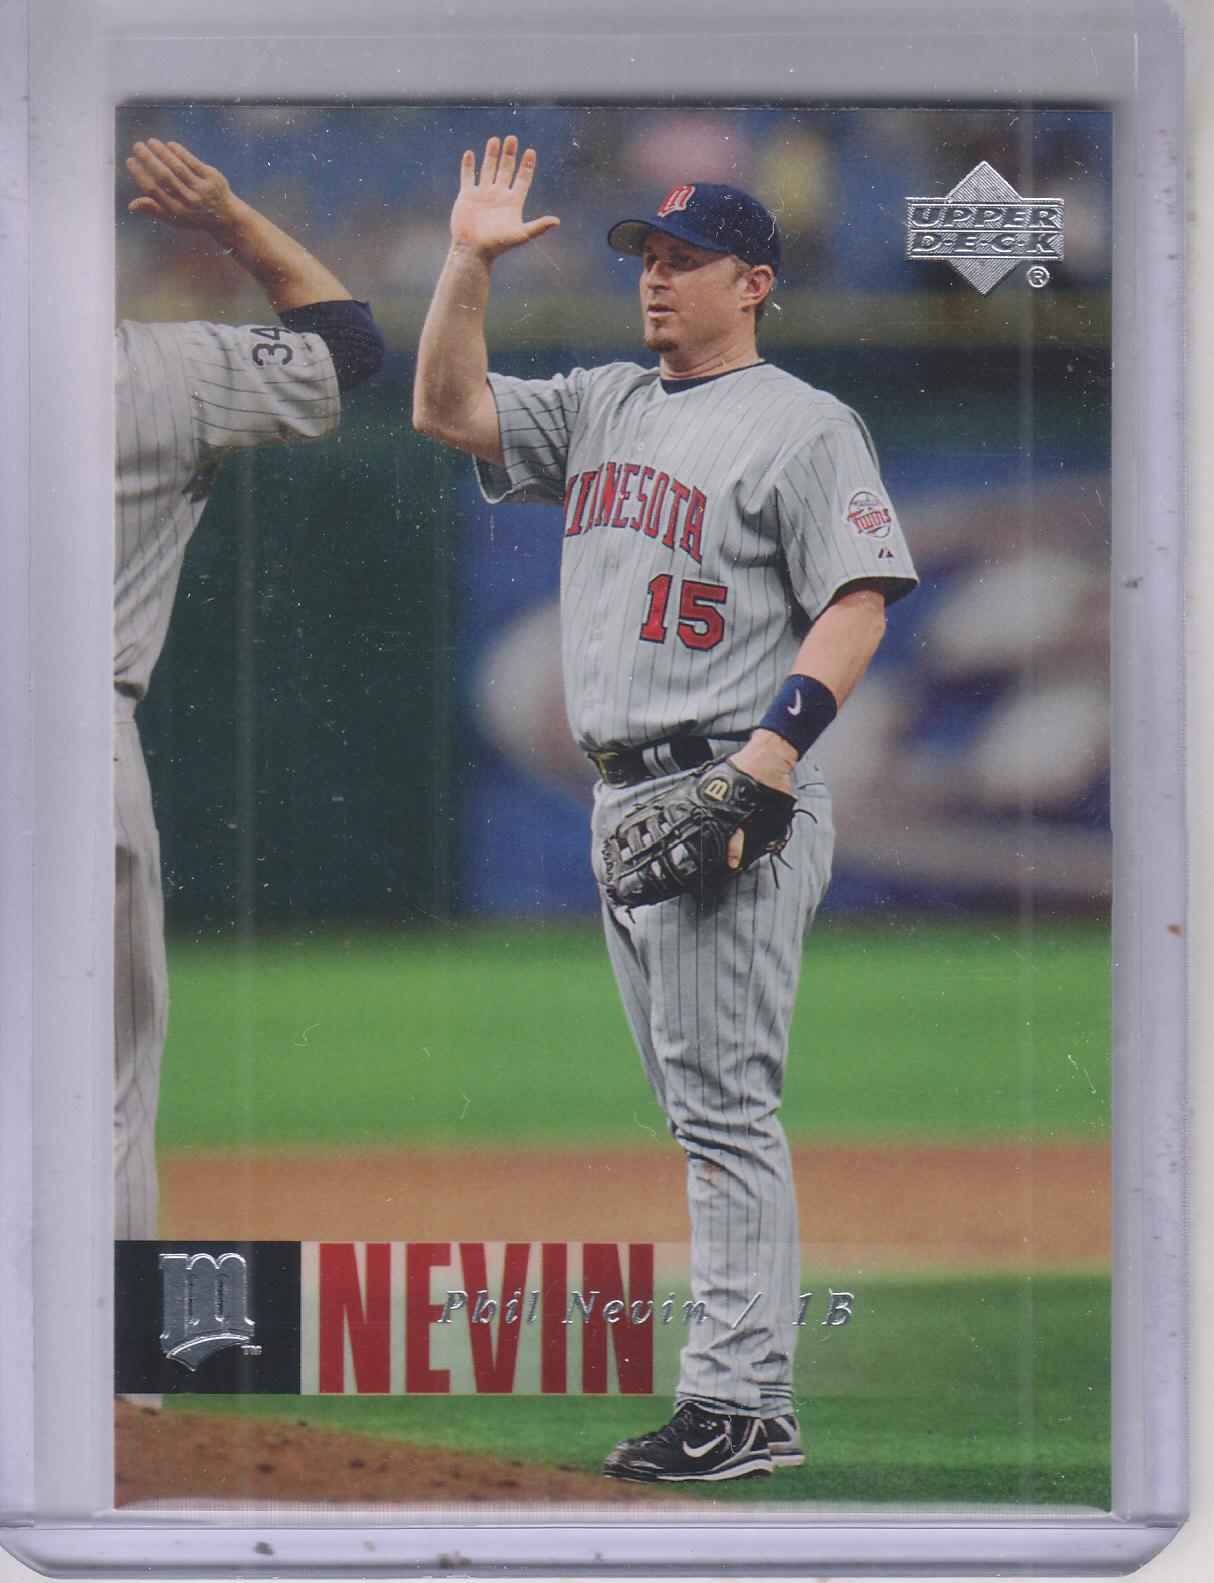 2006 Upper Deck #1149 Phil Nevin SP